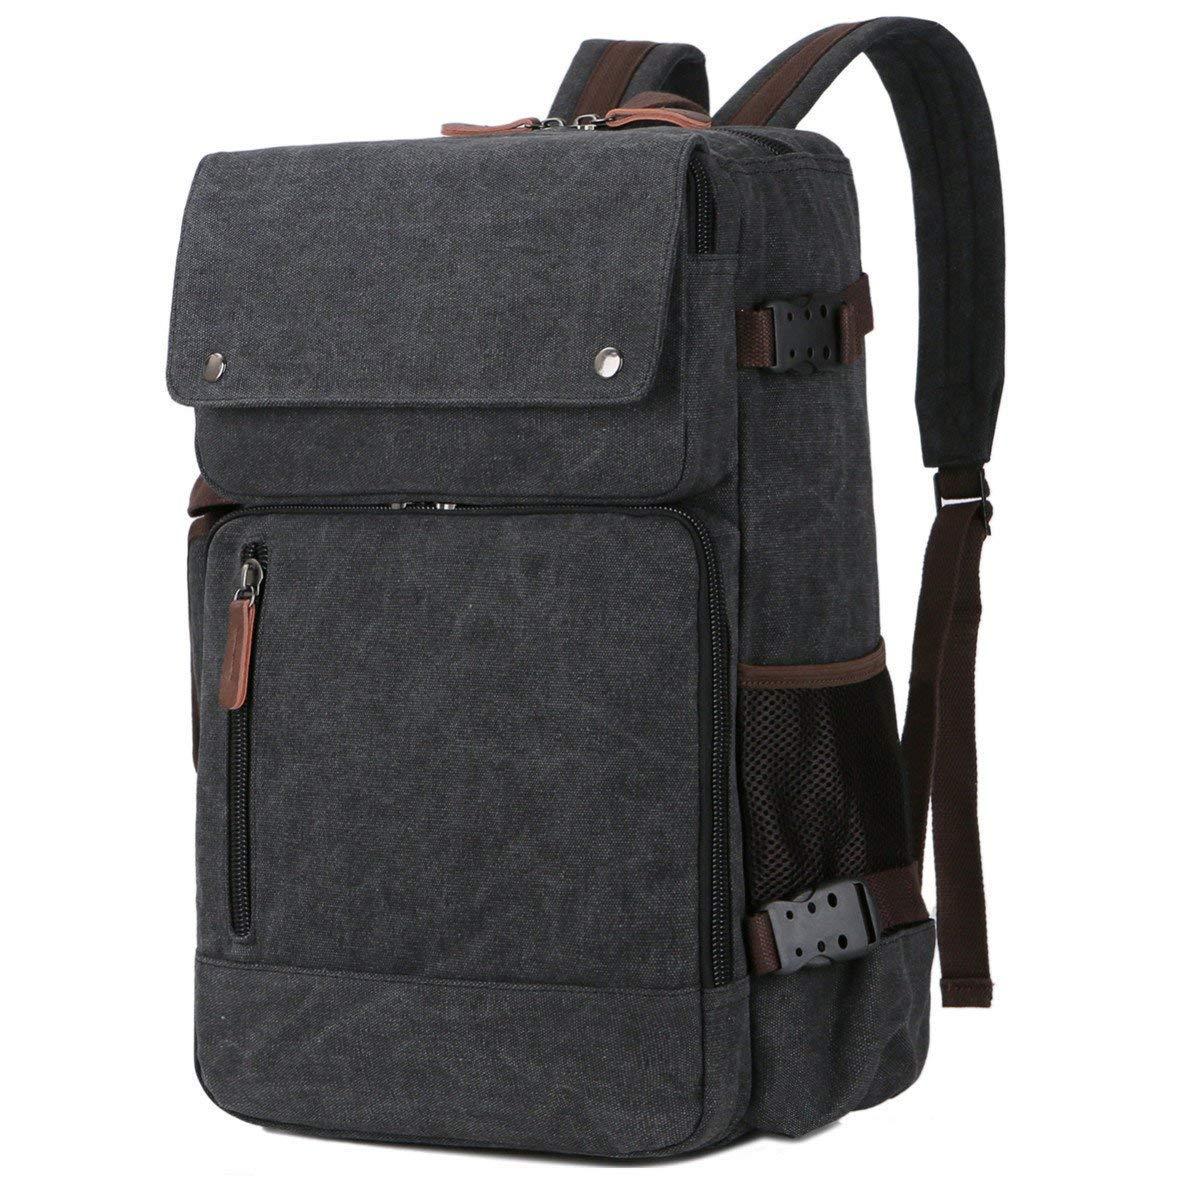 BAOSHA BC-08 3-in-1 Multifunction Men's Briefcase Rucksack Messenger Bag Convertible Vintage Canvas Laptop Backpack 15.6 inch Laptop Bags Handbag Travel Hiking Rucksack (Black) by Baosha